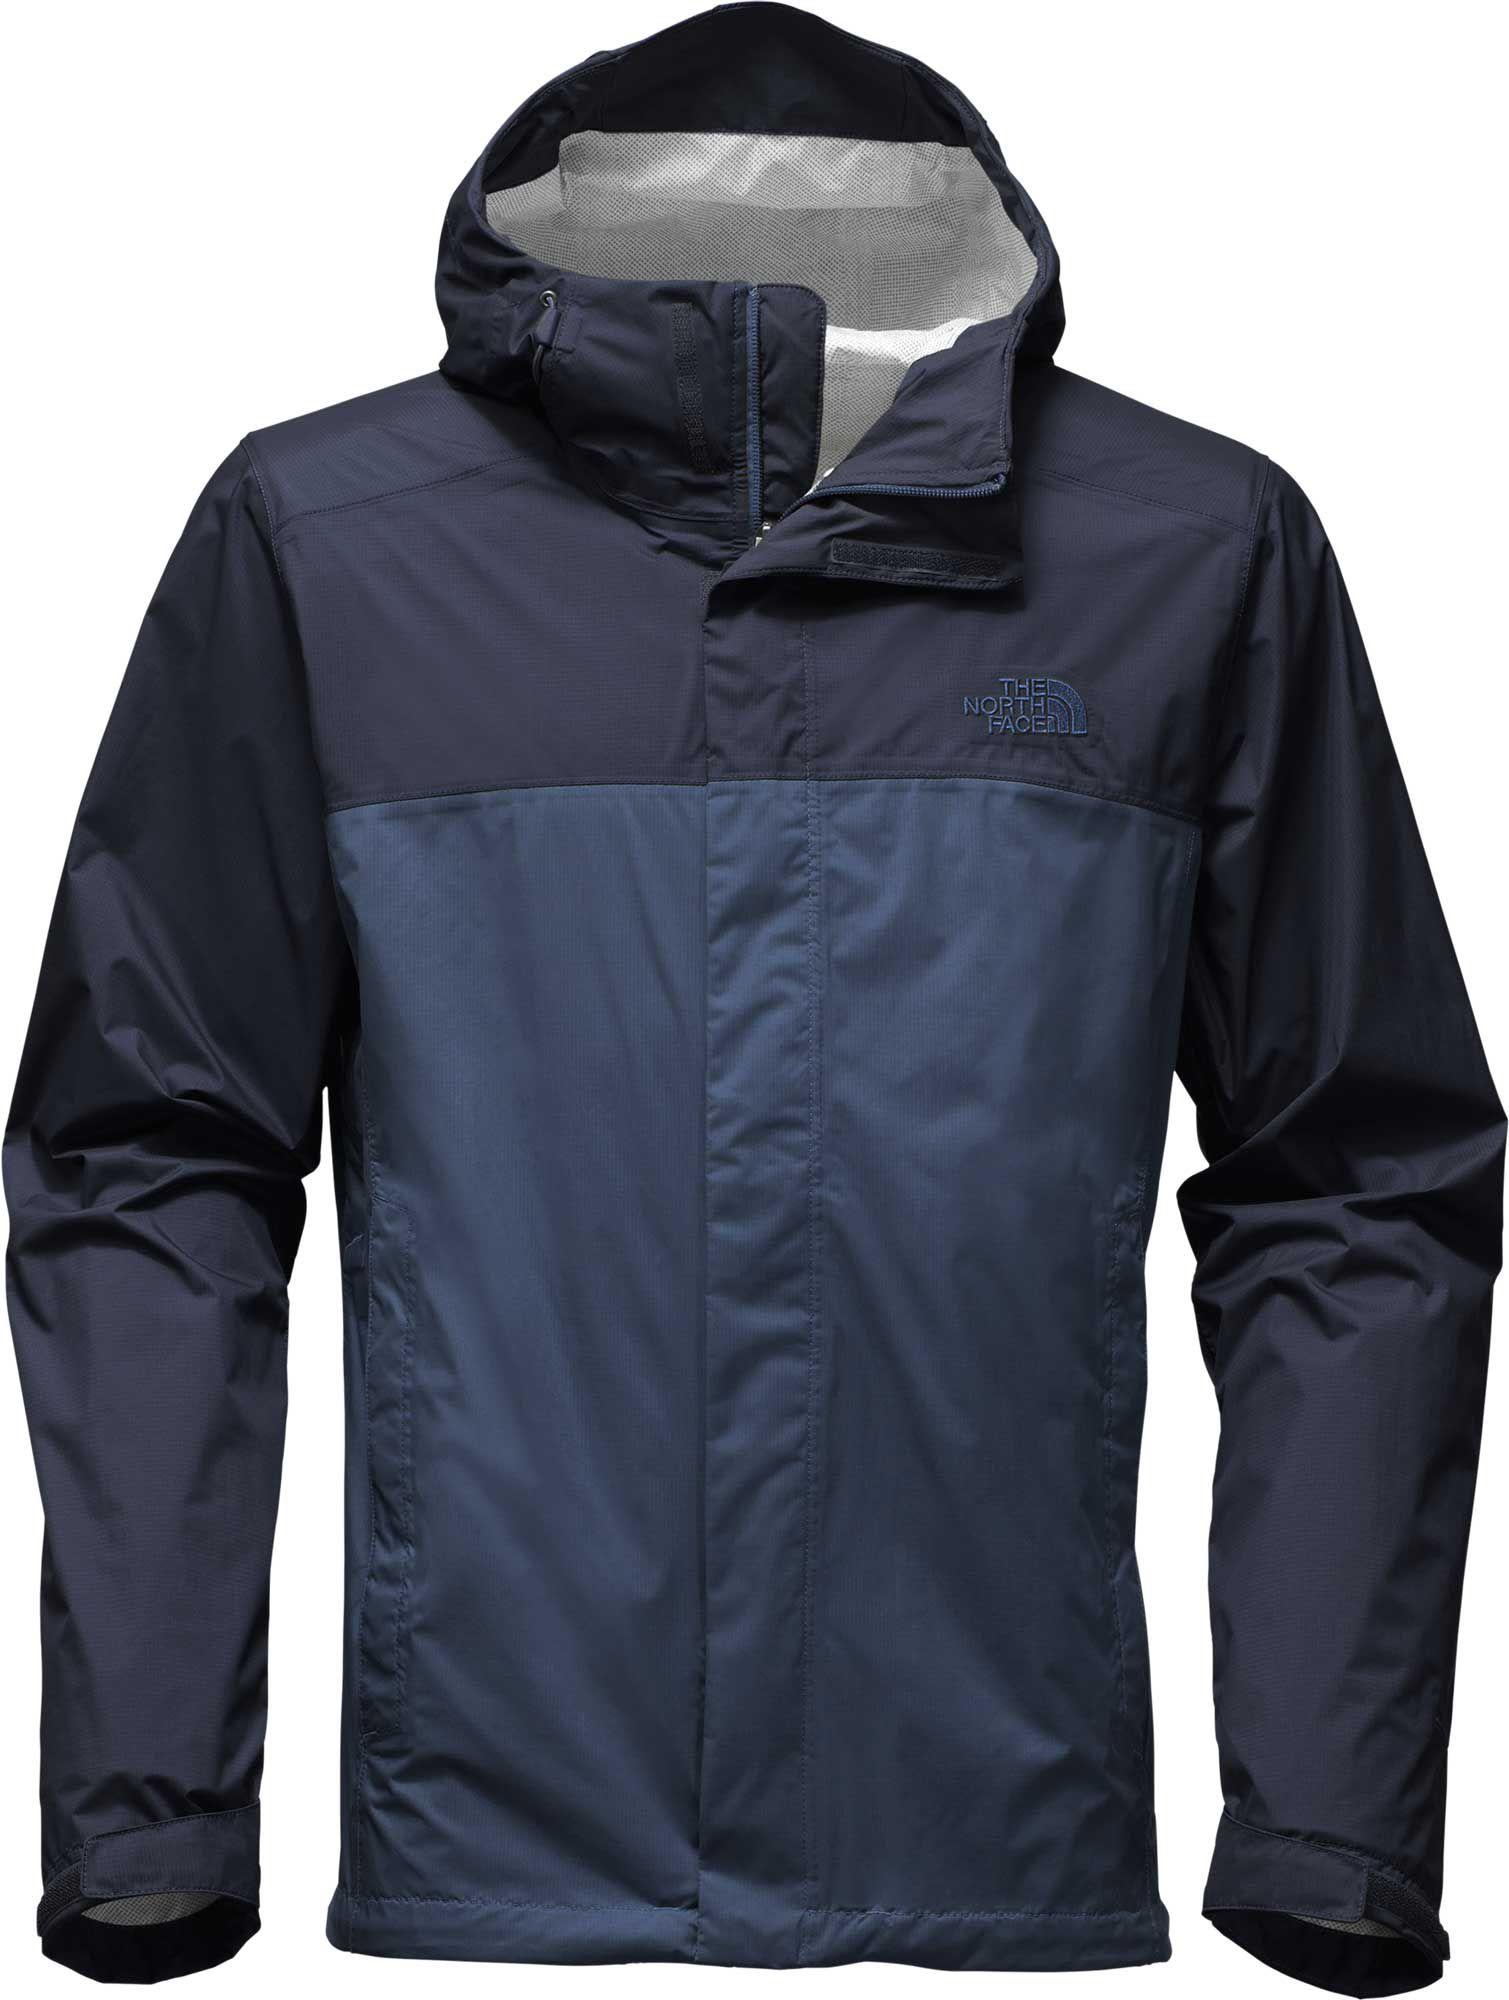 The north face men's venture jacket black